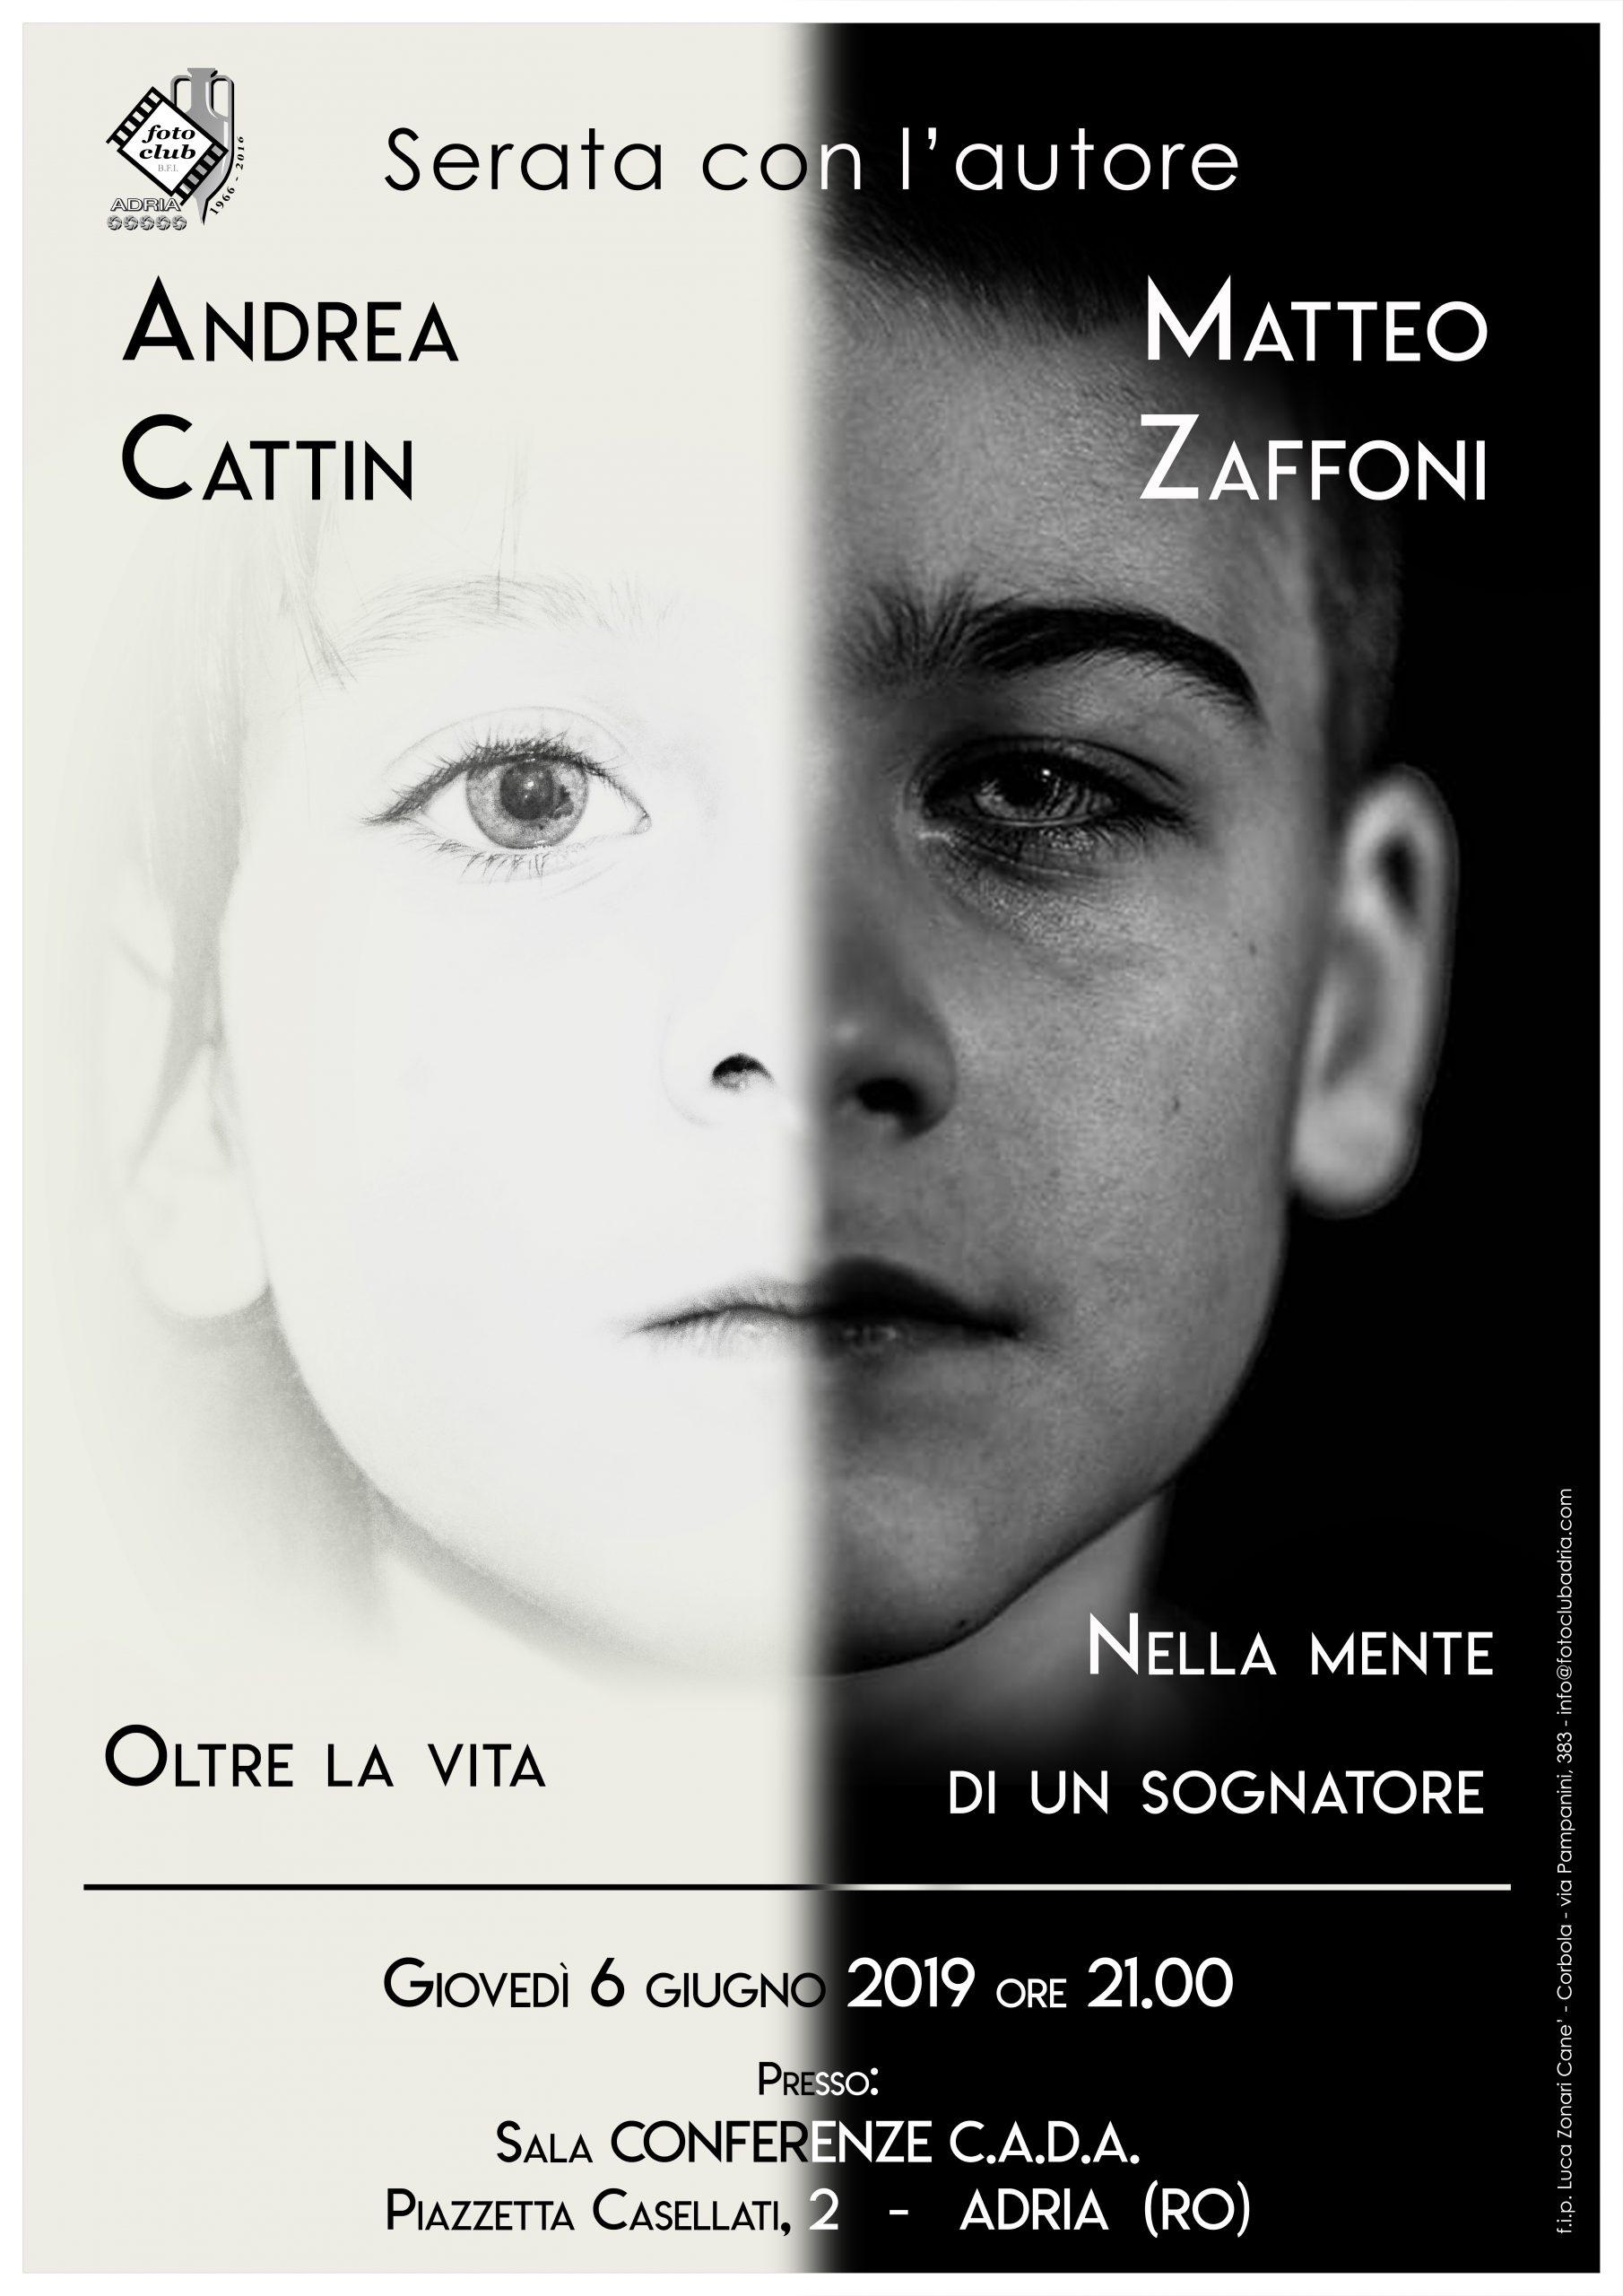 2019-06-06 Andrea Cattin e Matteo Zaffoni